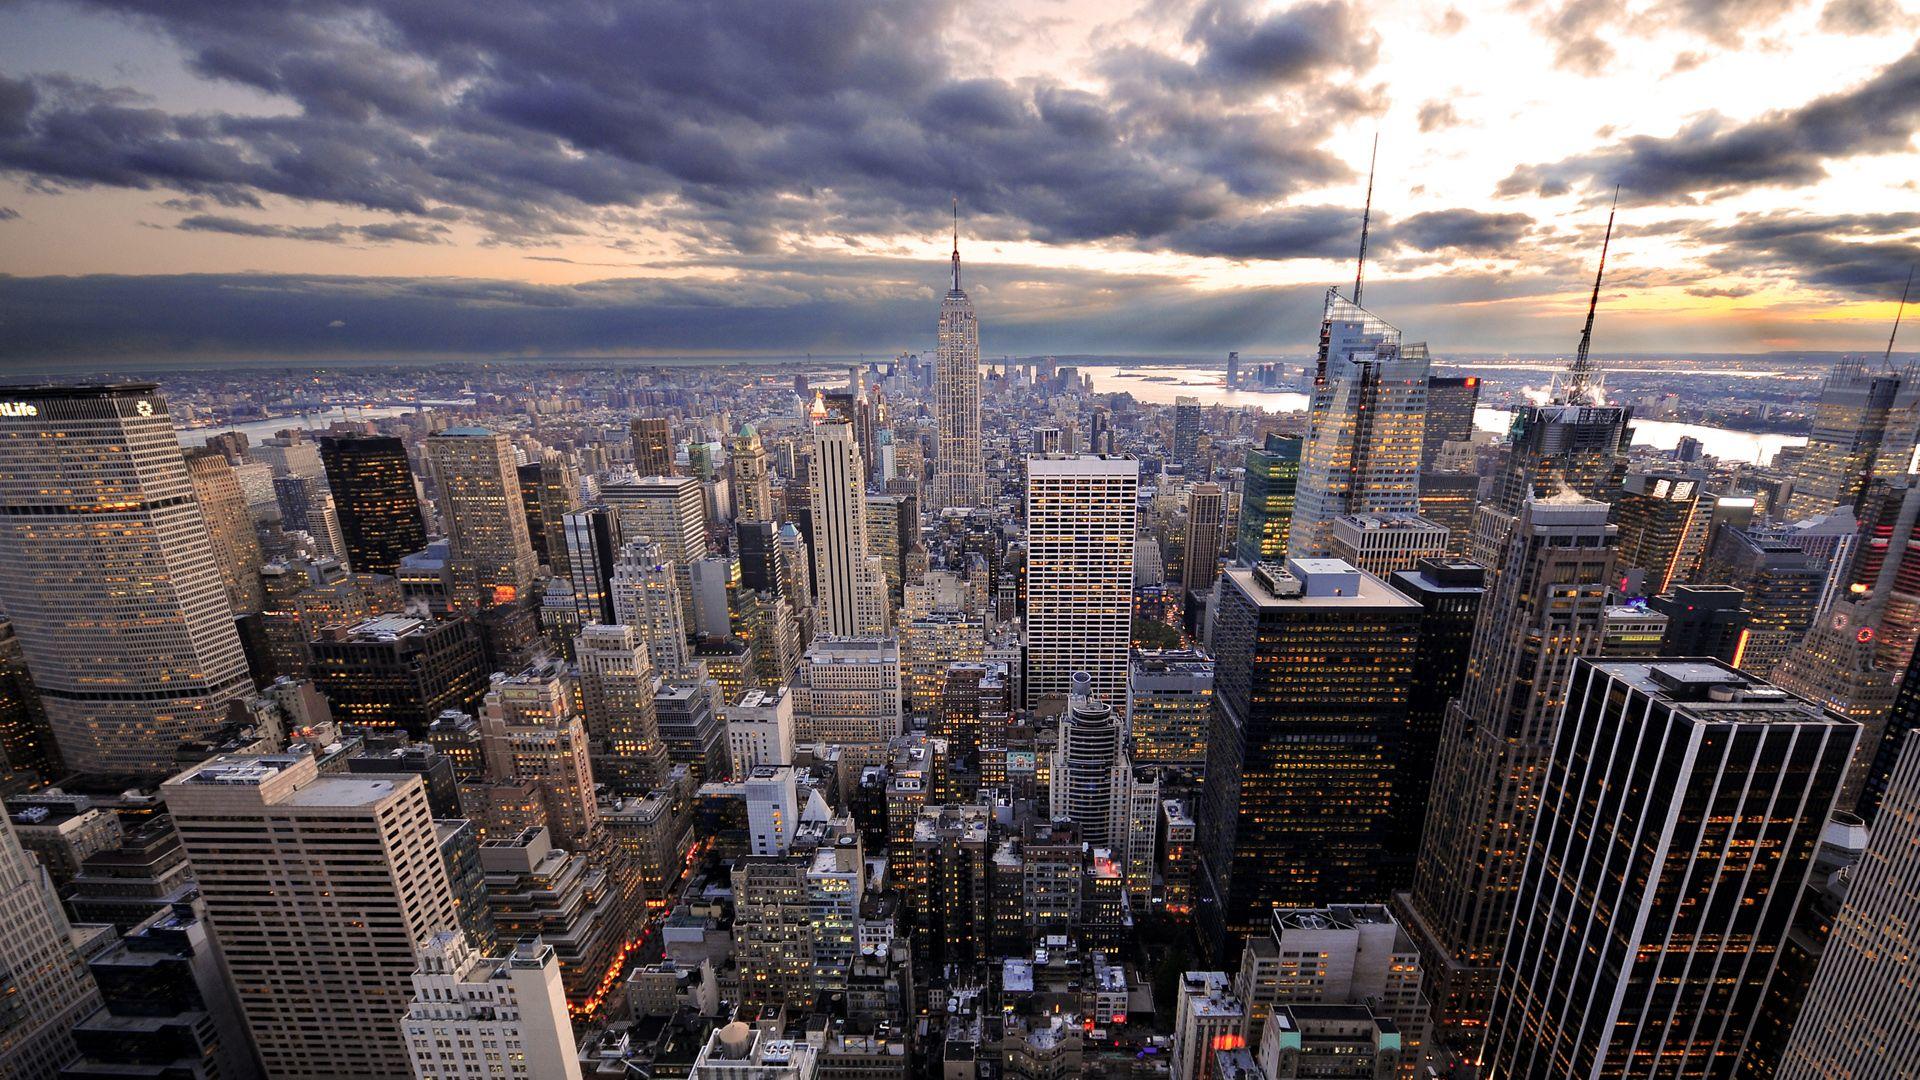 Top Interior Designers in NYC interior designer Top Interior Designers in NYC – 5 unique designers of New York City nyc wallpaper hd 1